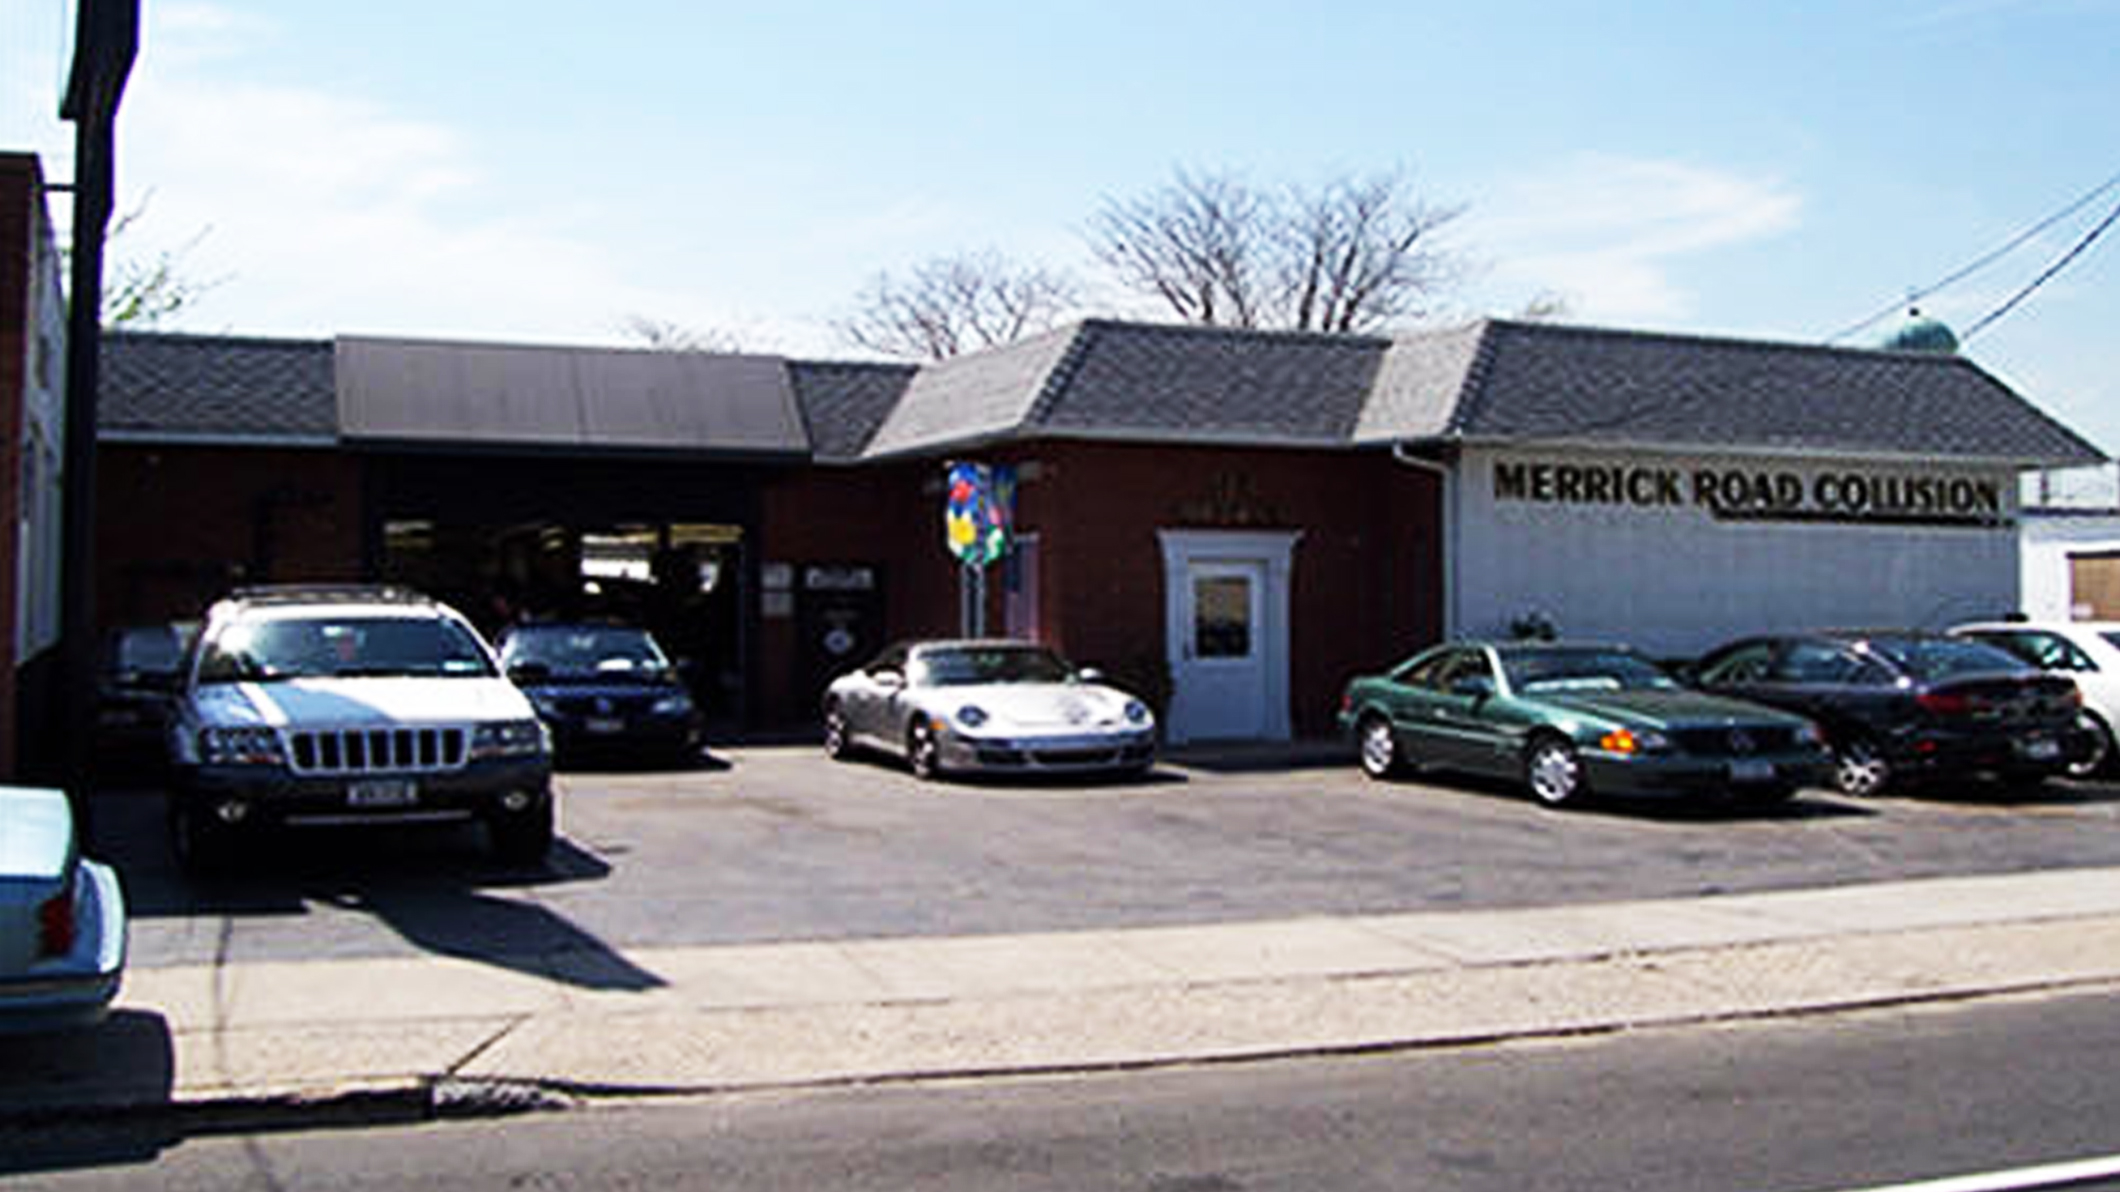 Merrick Road Collision - ad image